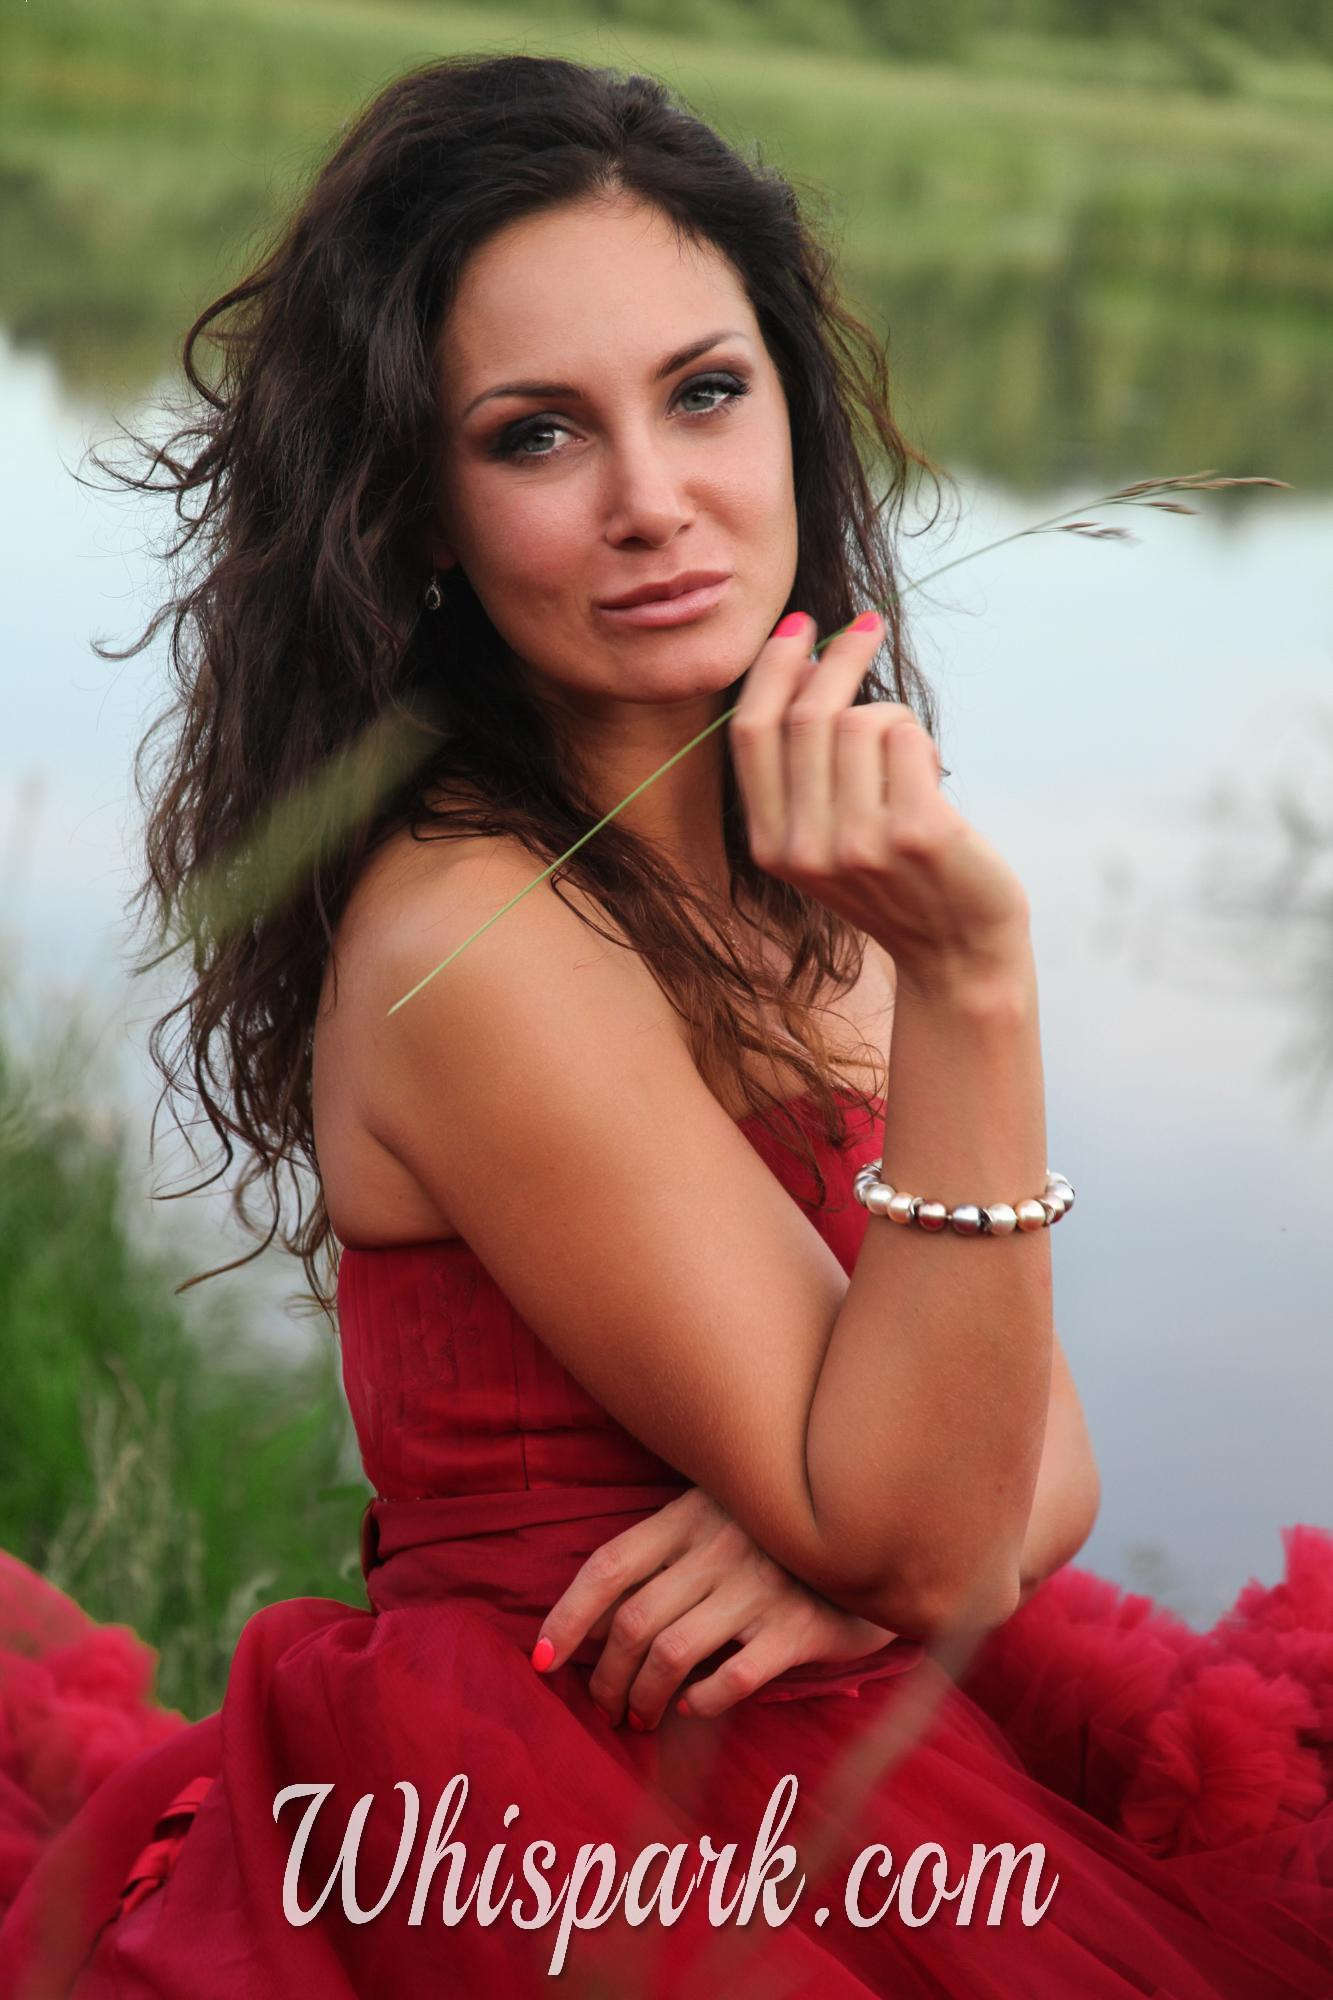 Tatiyana  a single women from Russian